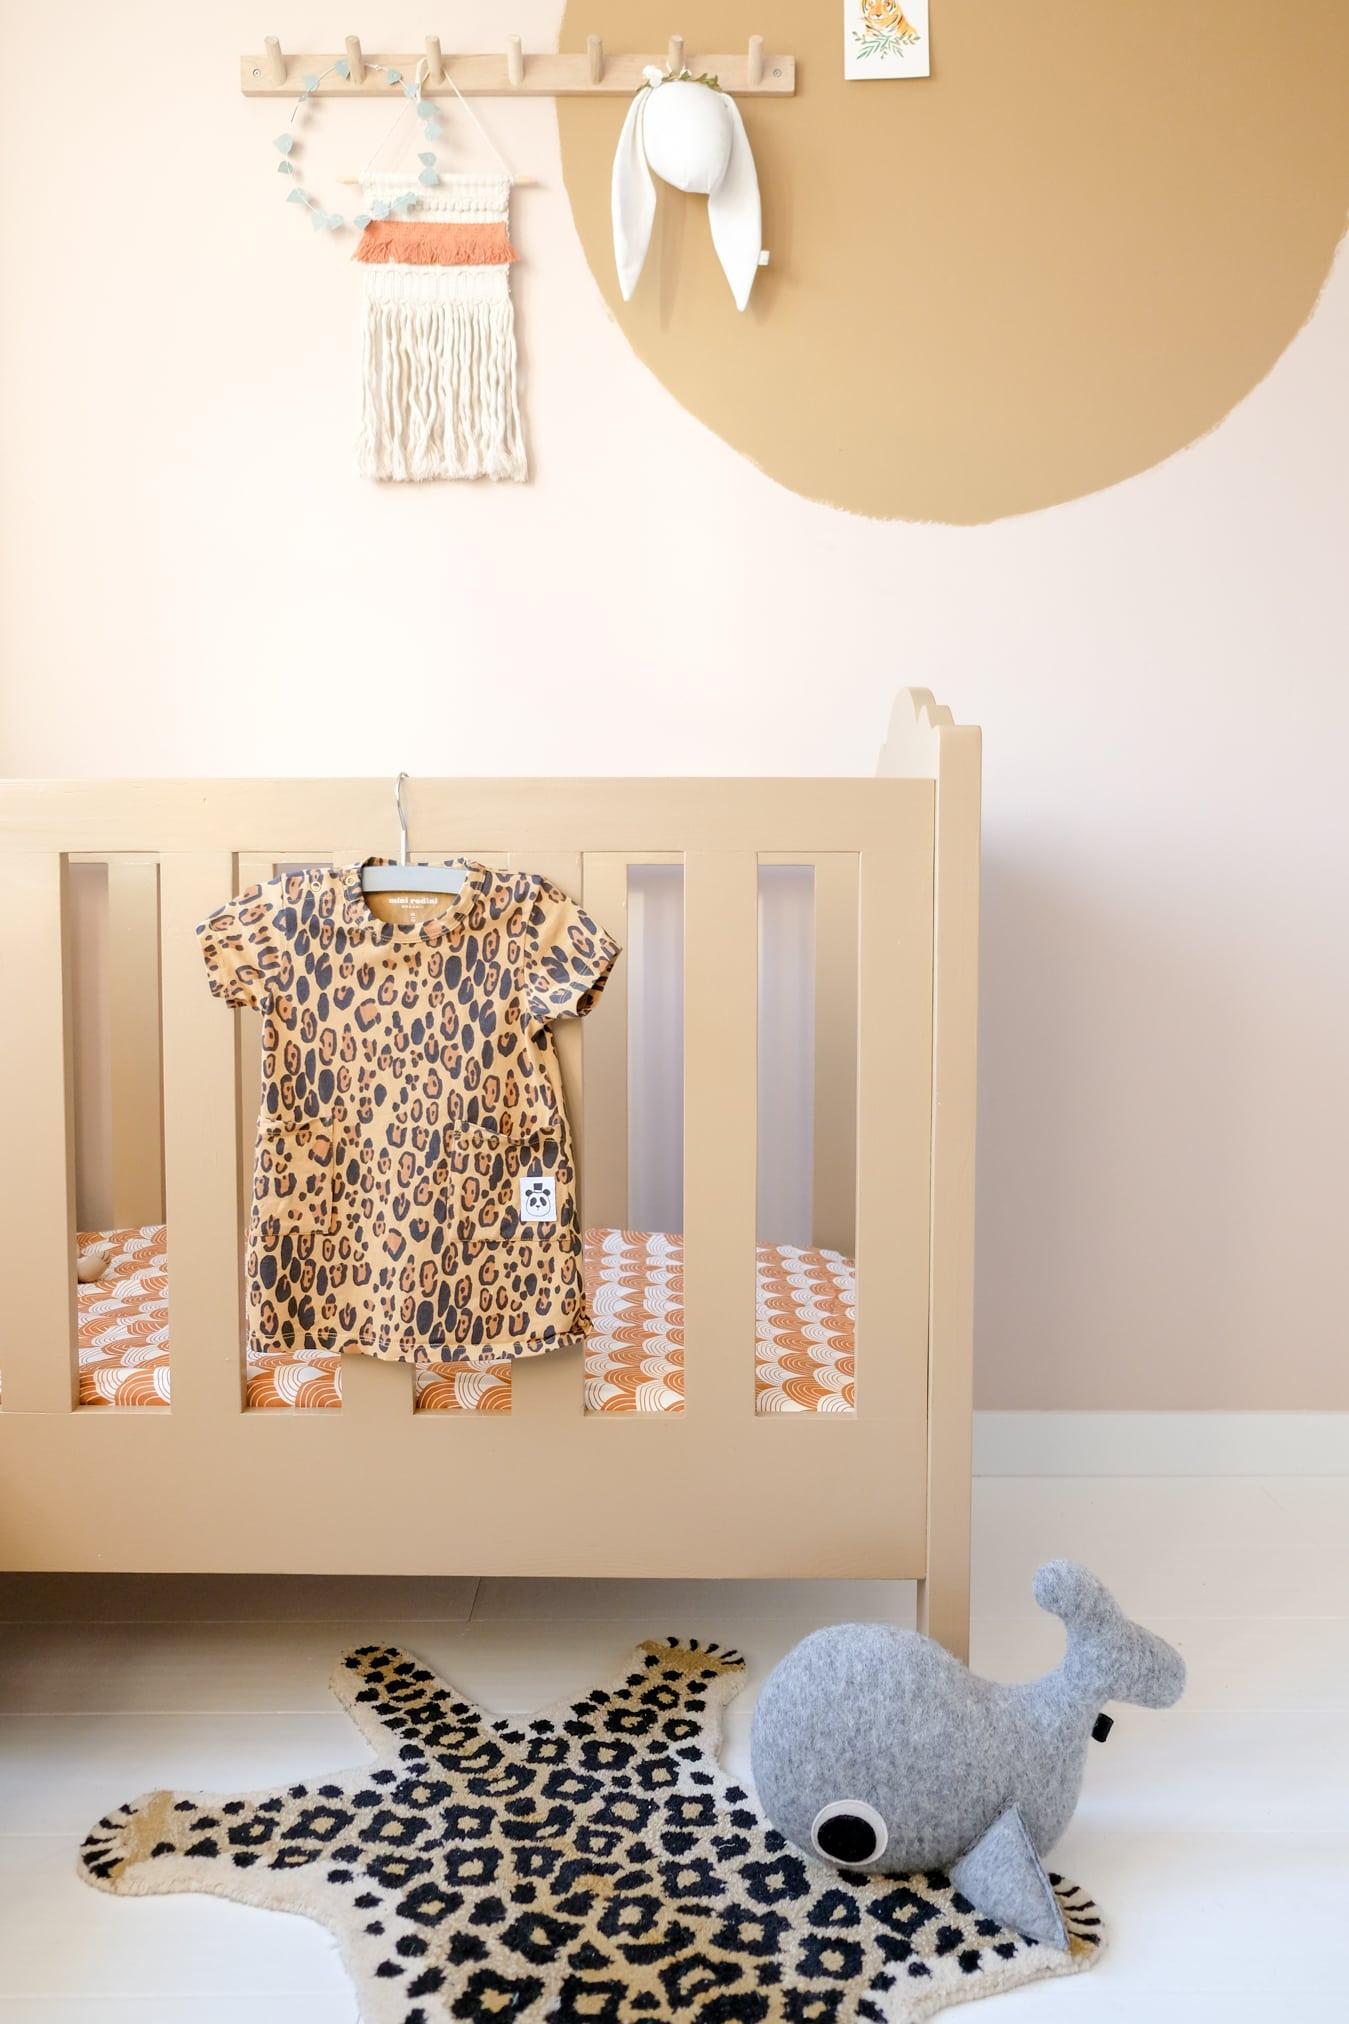 meubels spiced honey schilderen